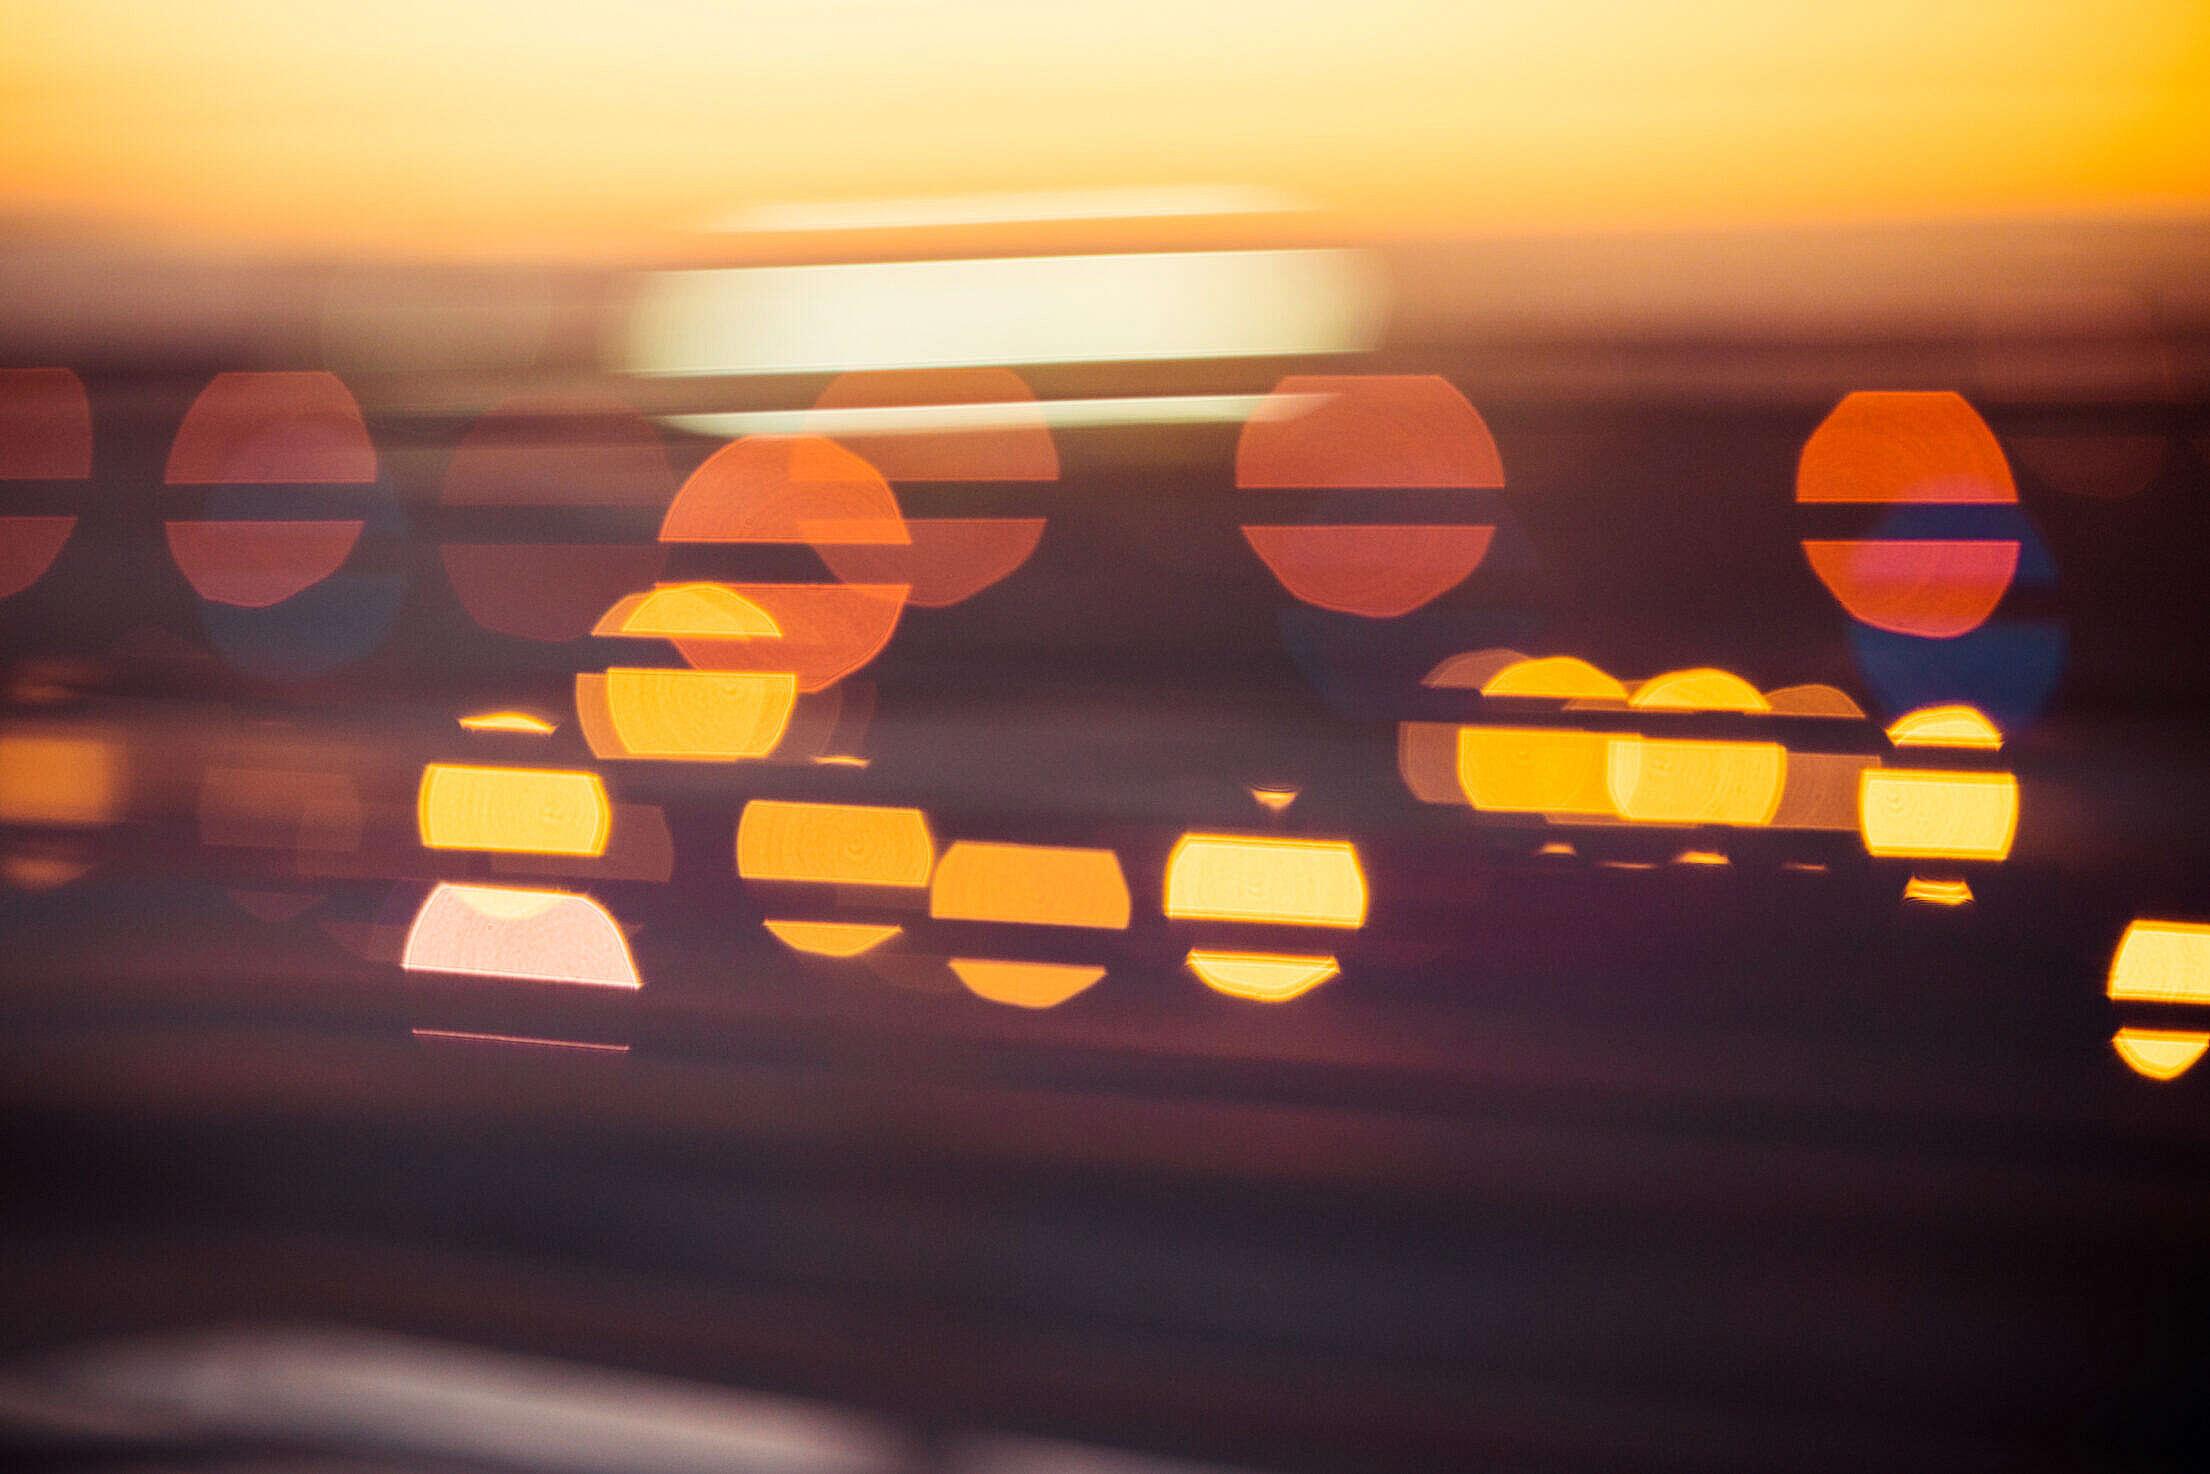 Evening Sunset Abstract City Lights Bokeh Free Stock Photo